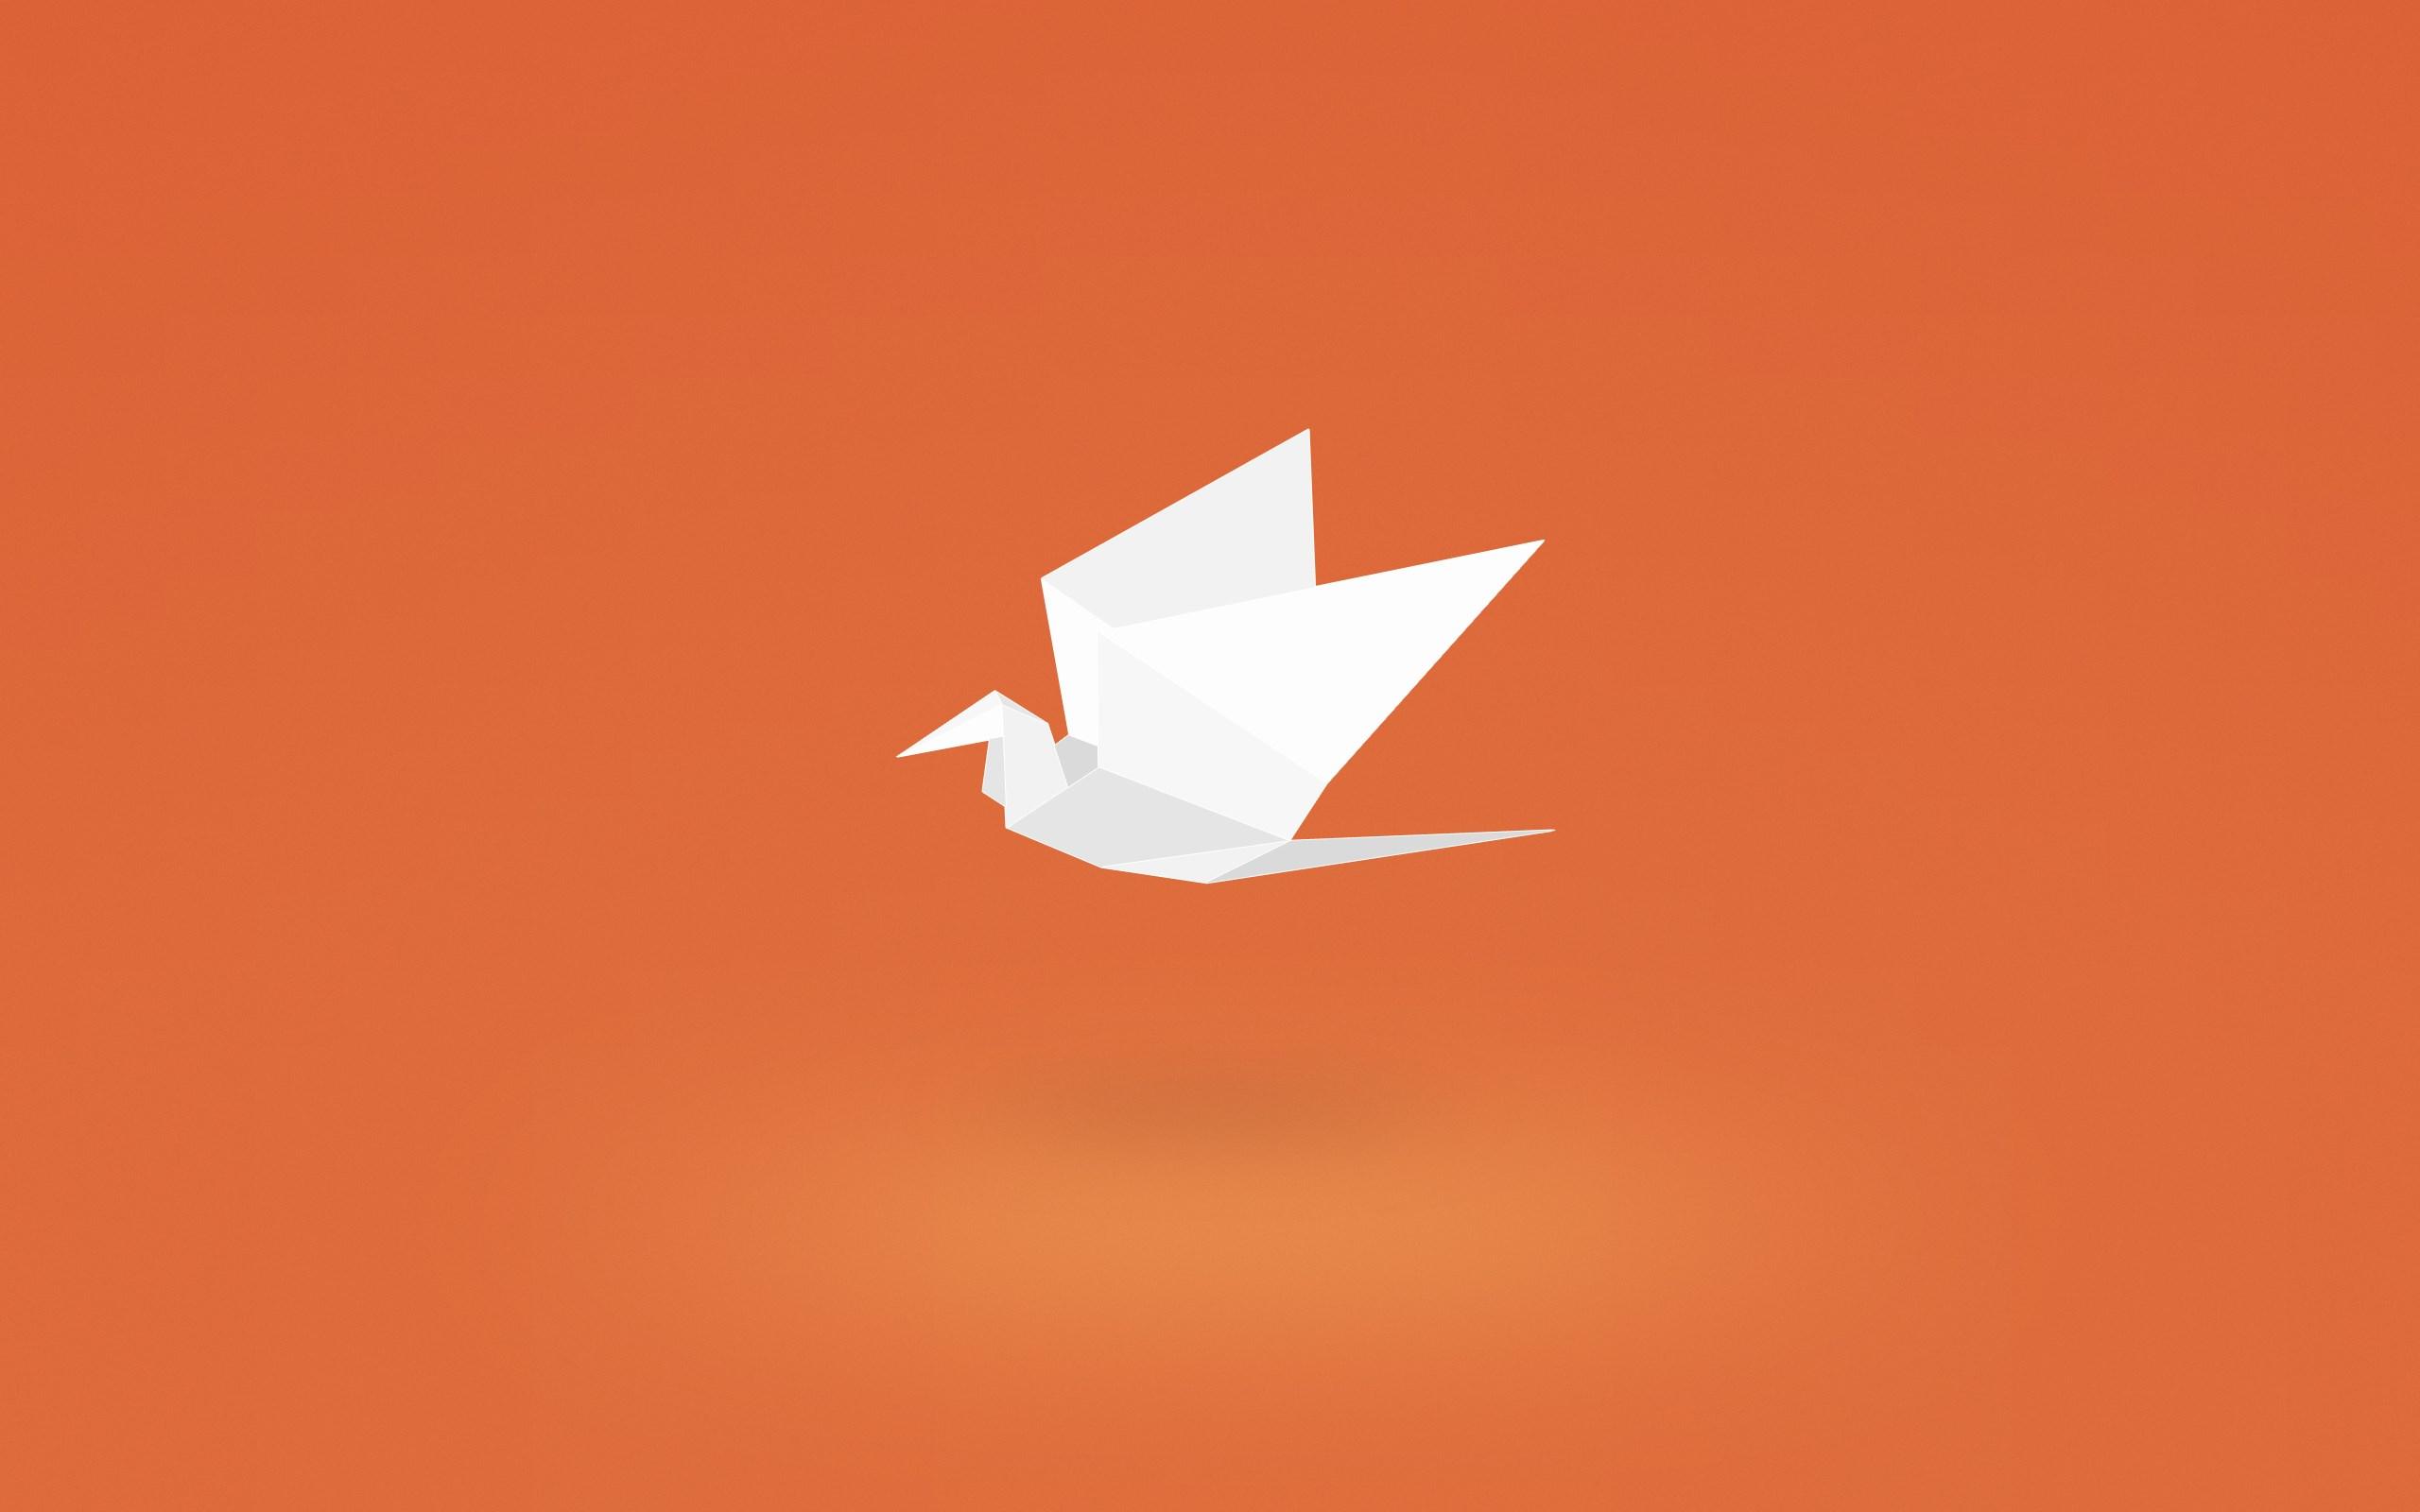 origami free wallpaper - photo #24